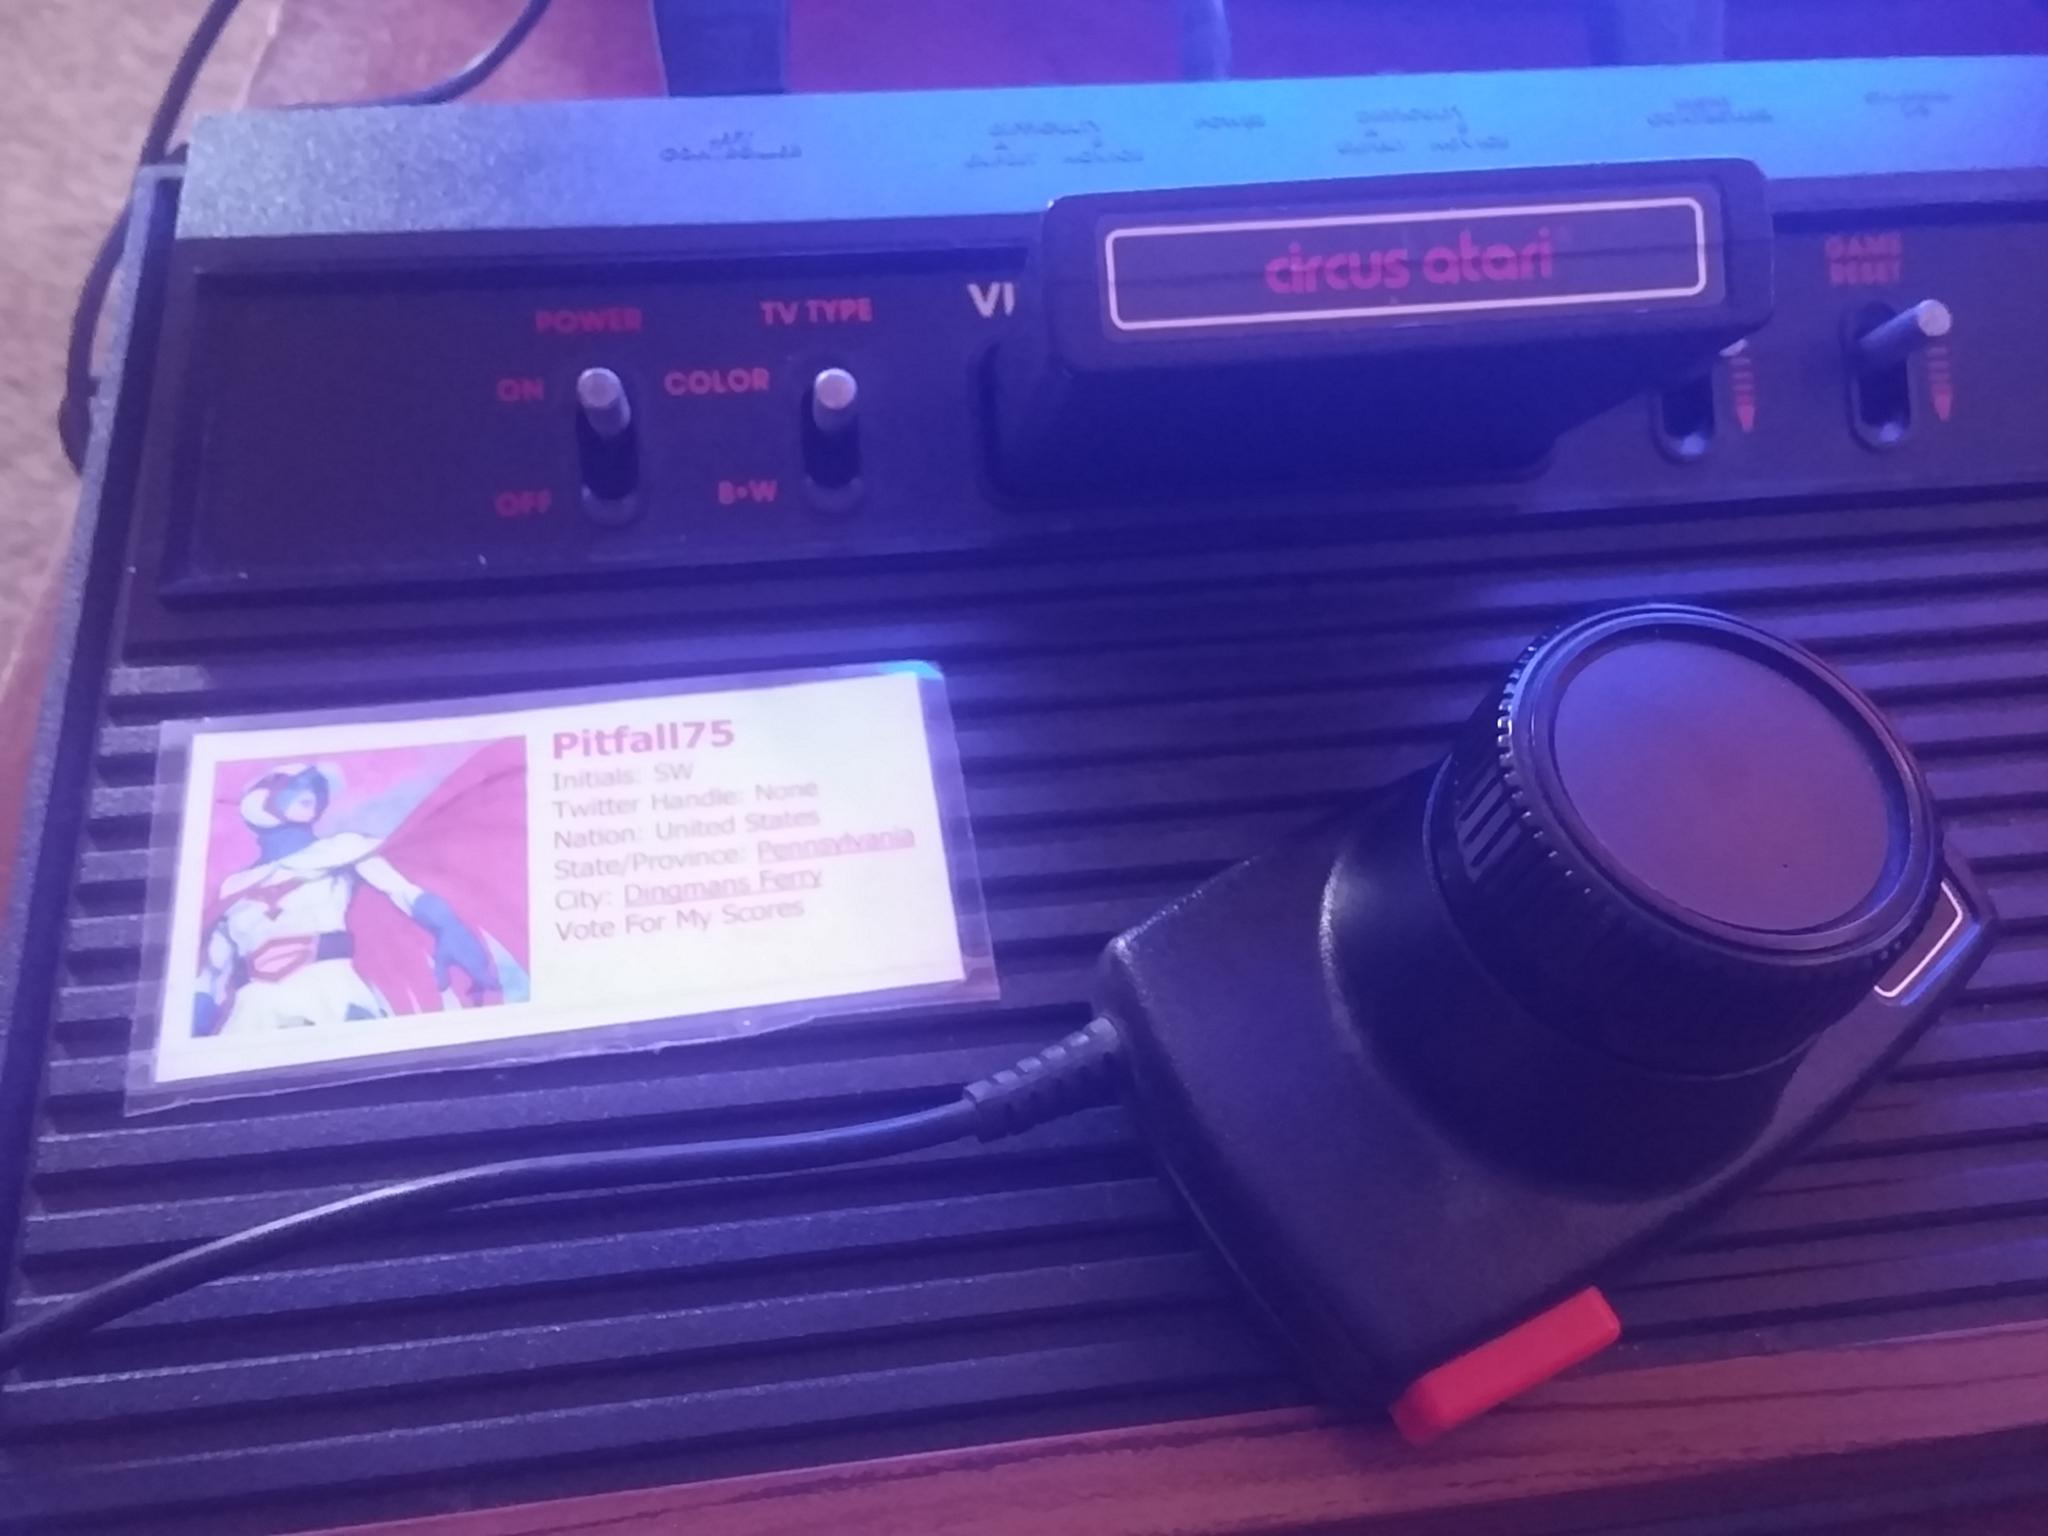 Circus Atari 3,393 points